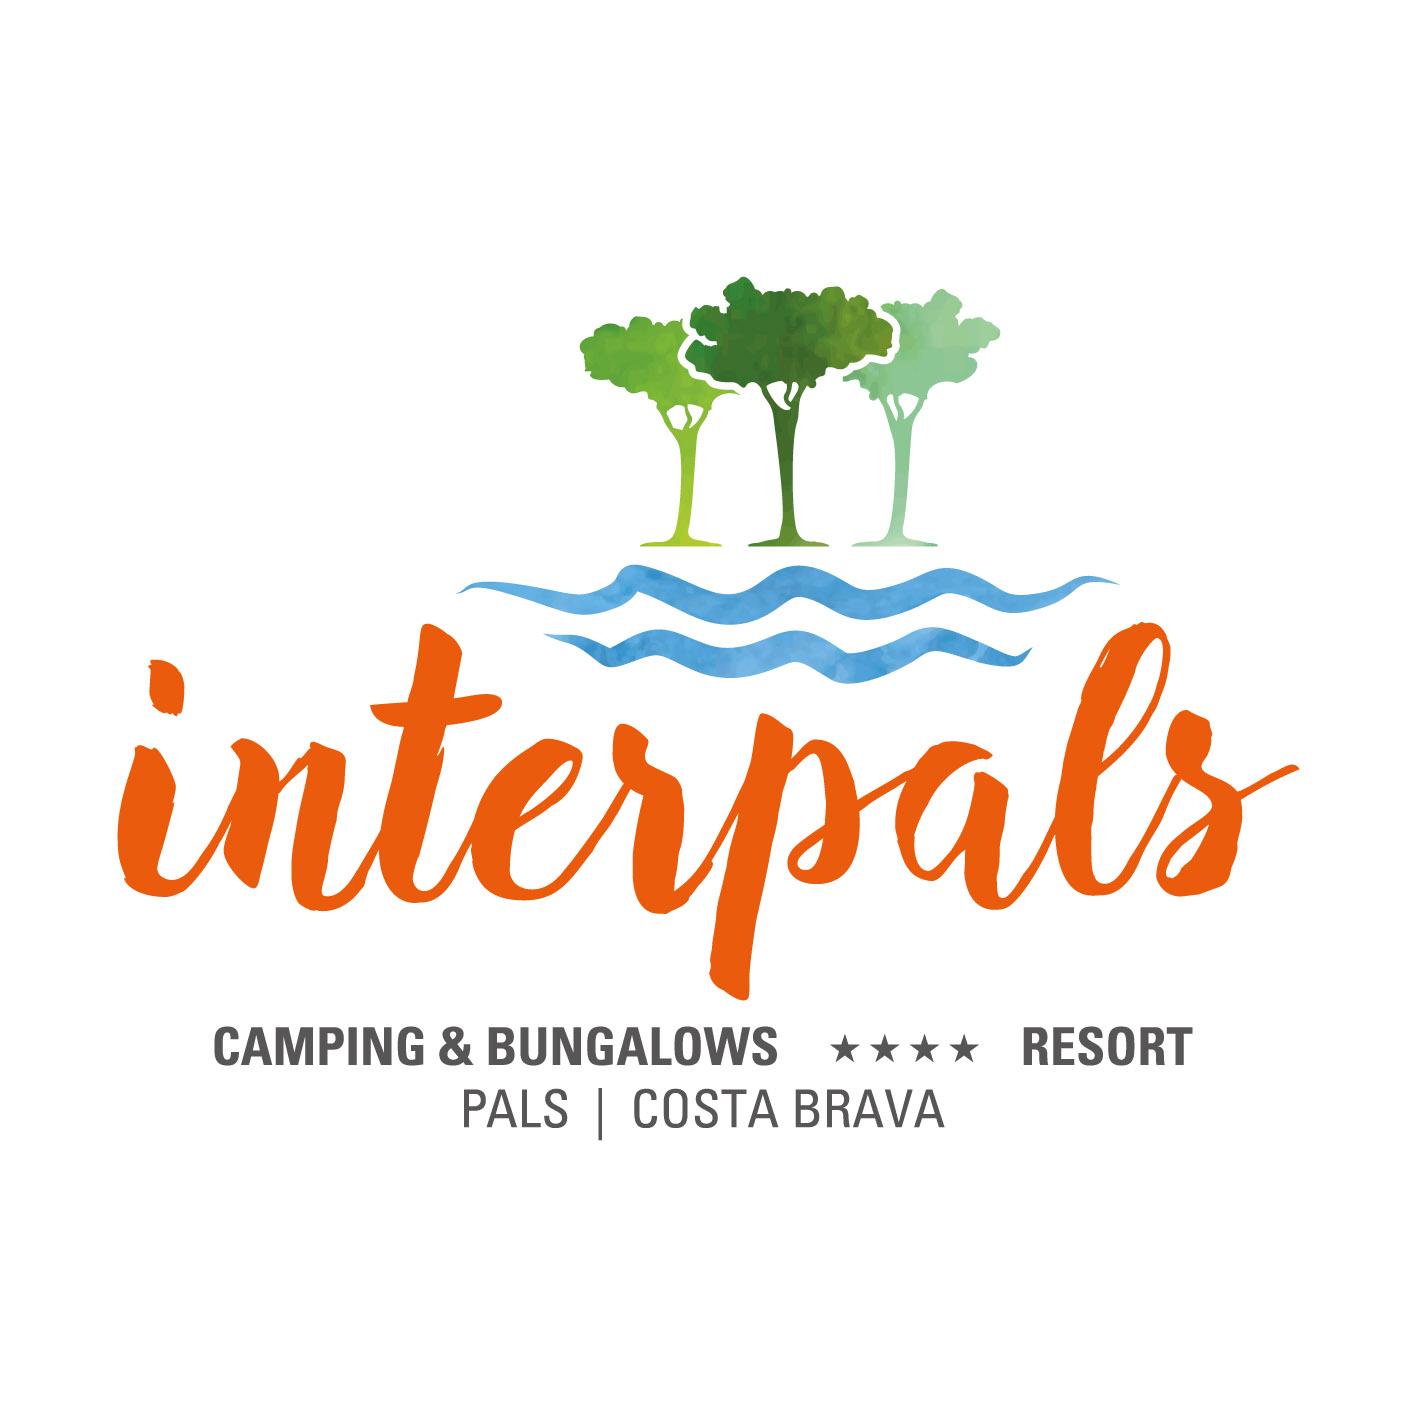 Imagen de Interpals,                                         propietario de Inter Pals